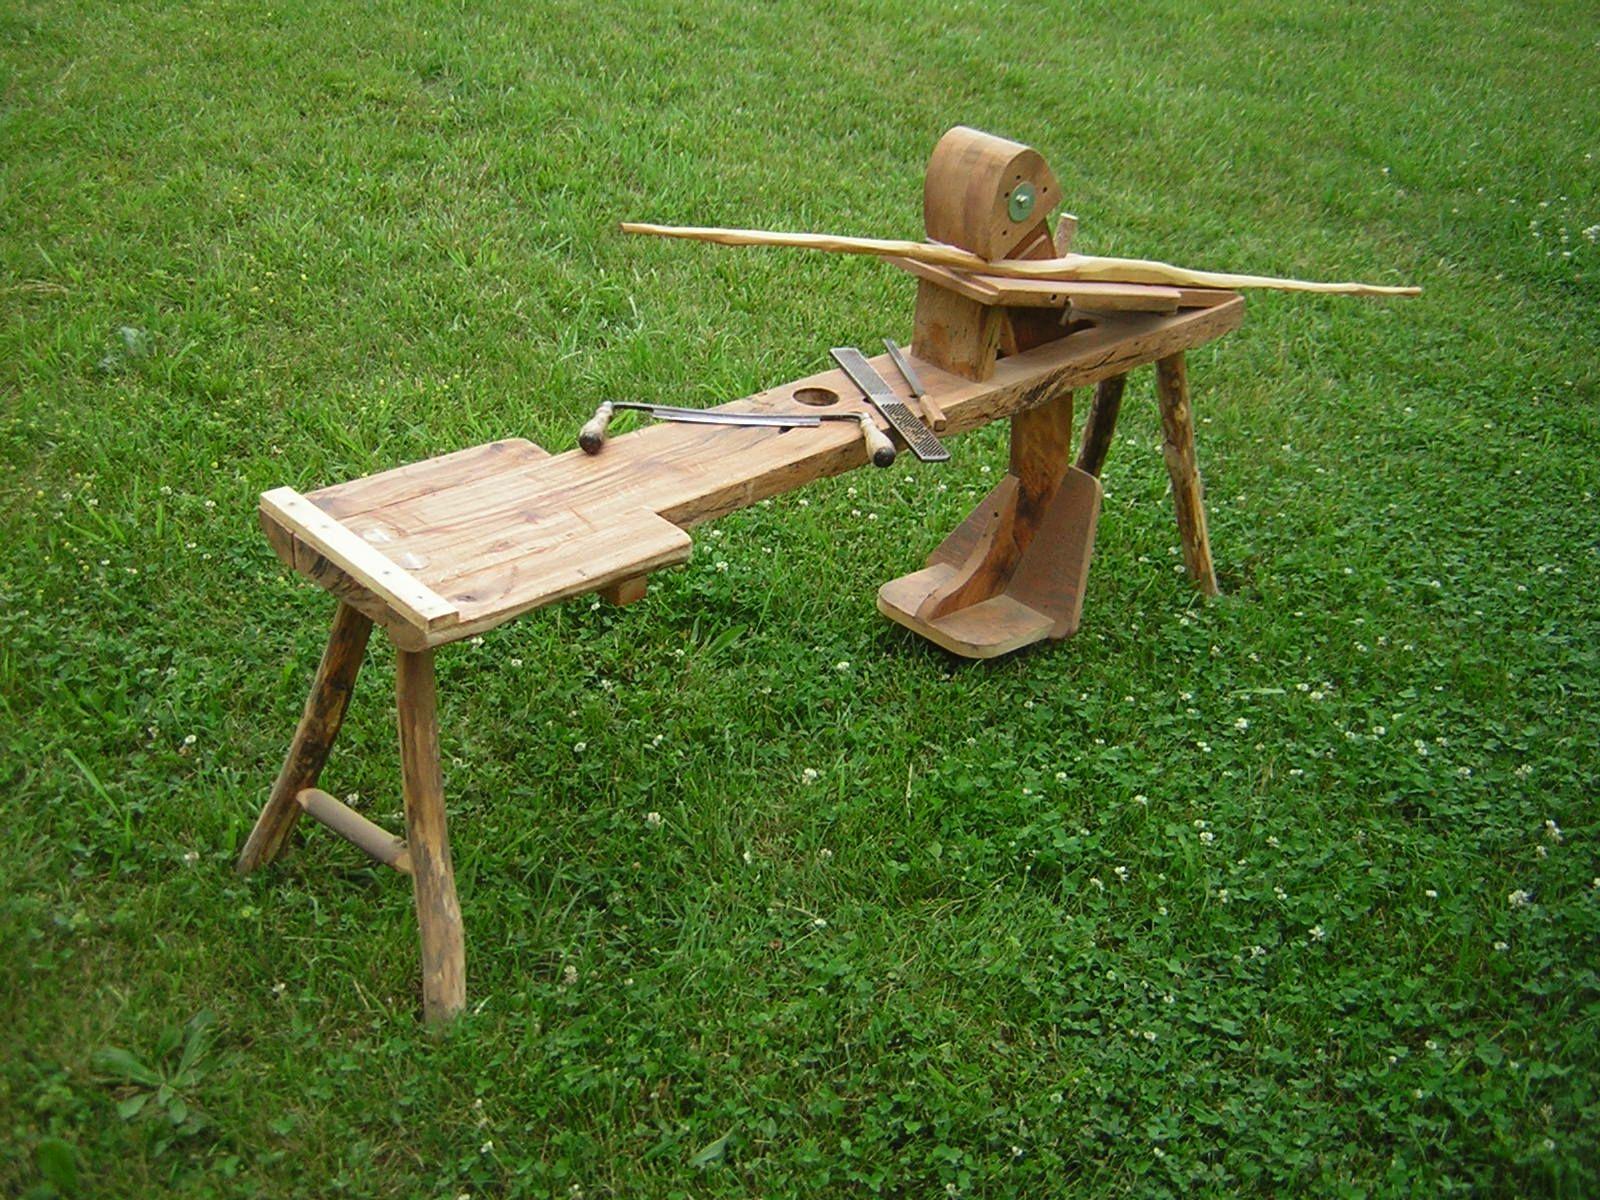 Shaving Horse – Preindustrial Craftsmanship